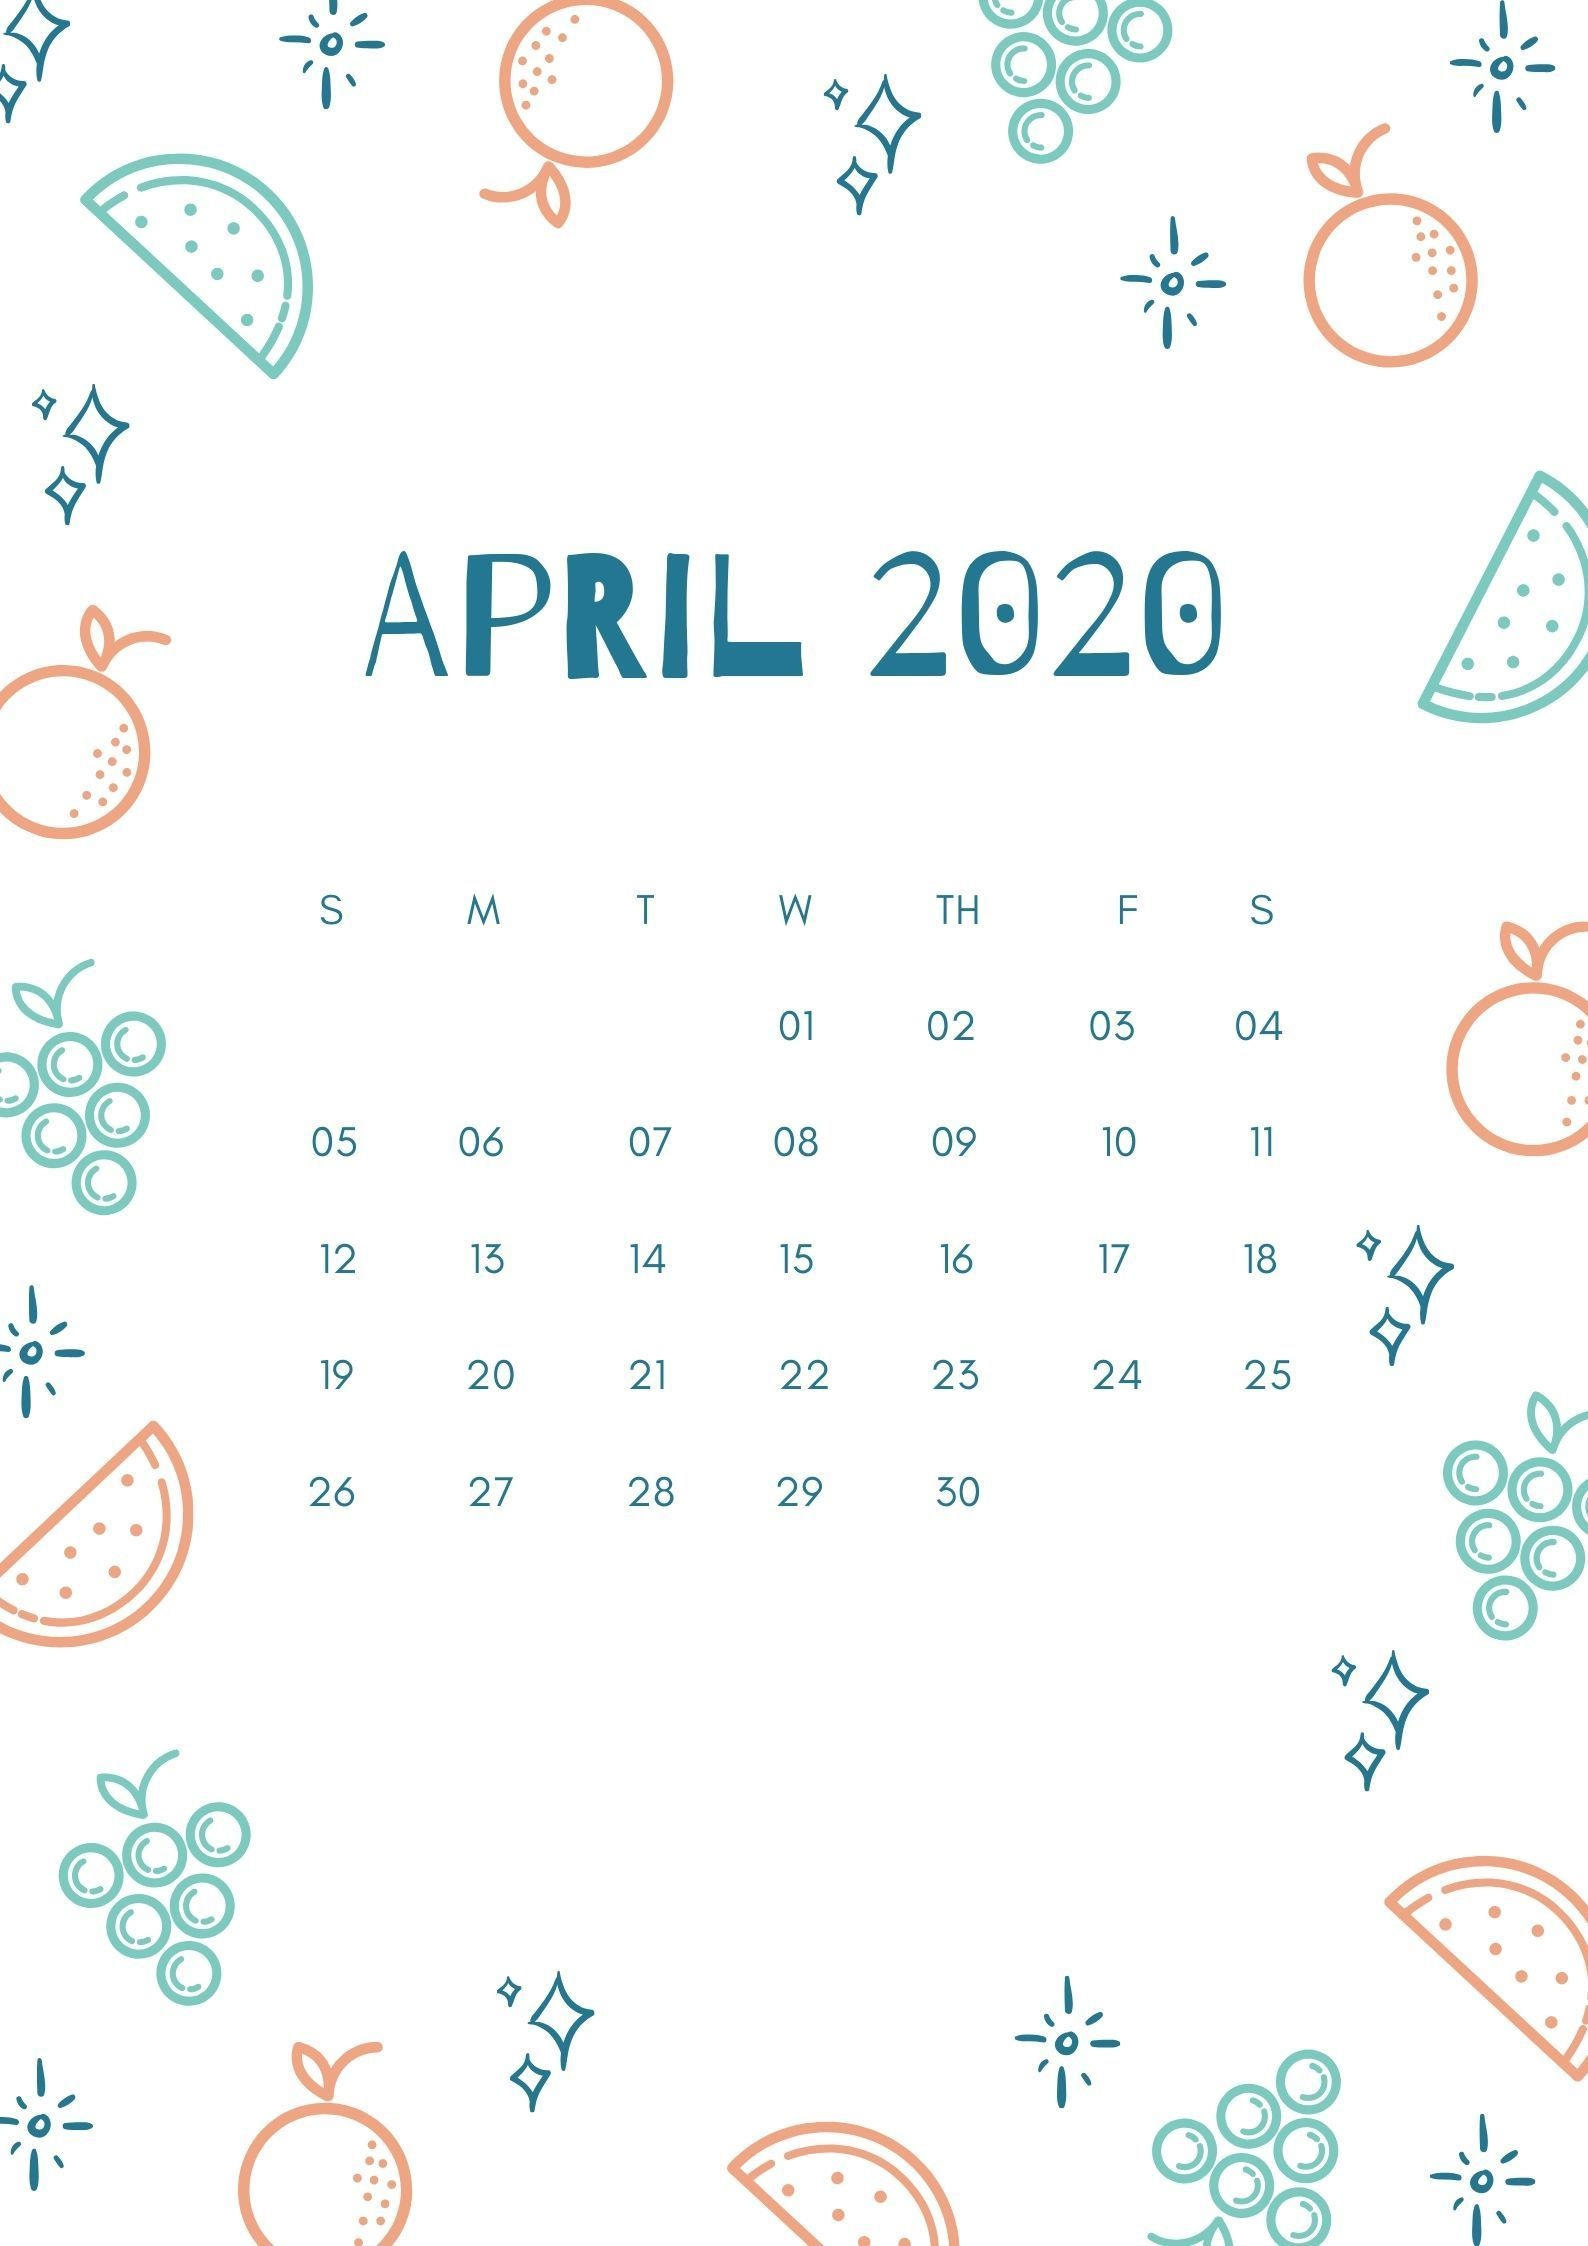 April 2020 Calendar Editable Templates